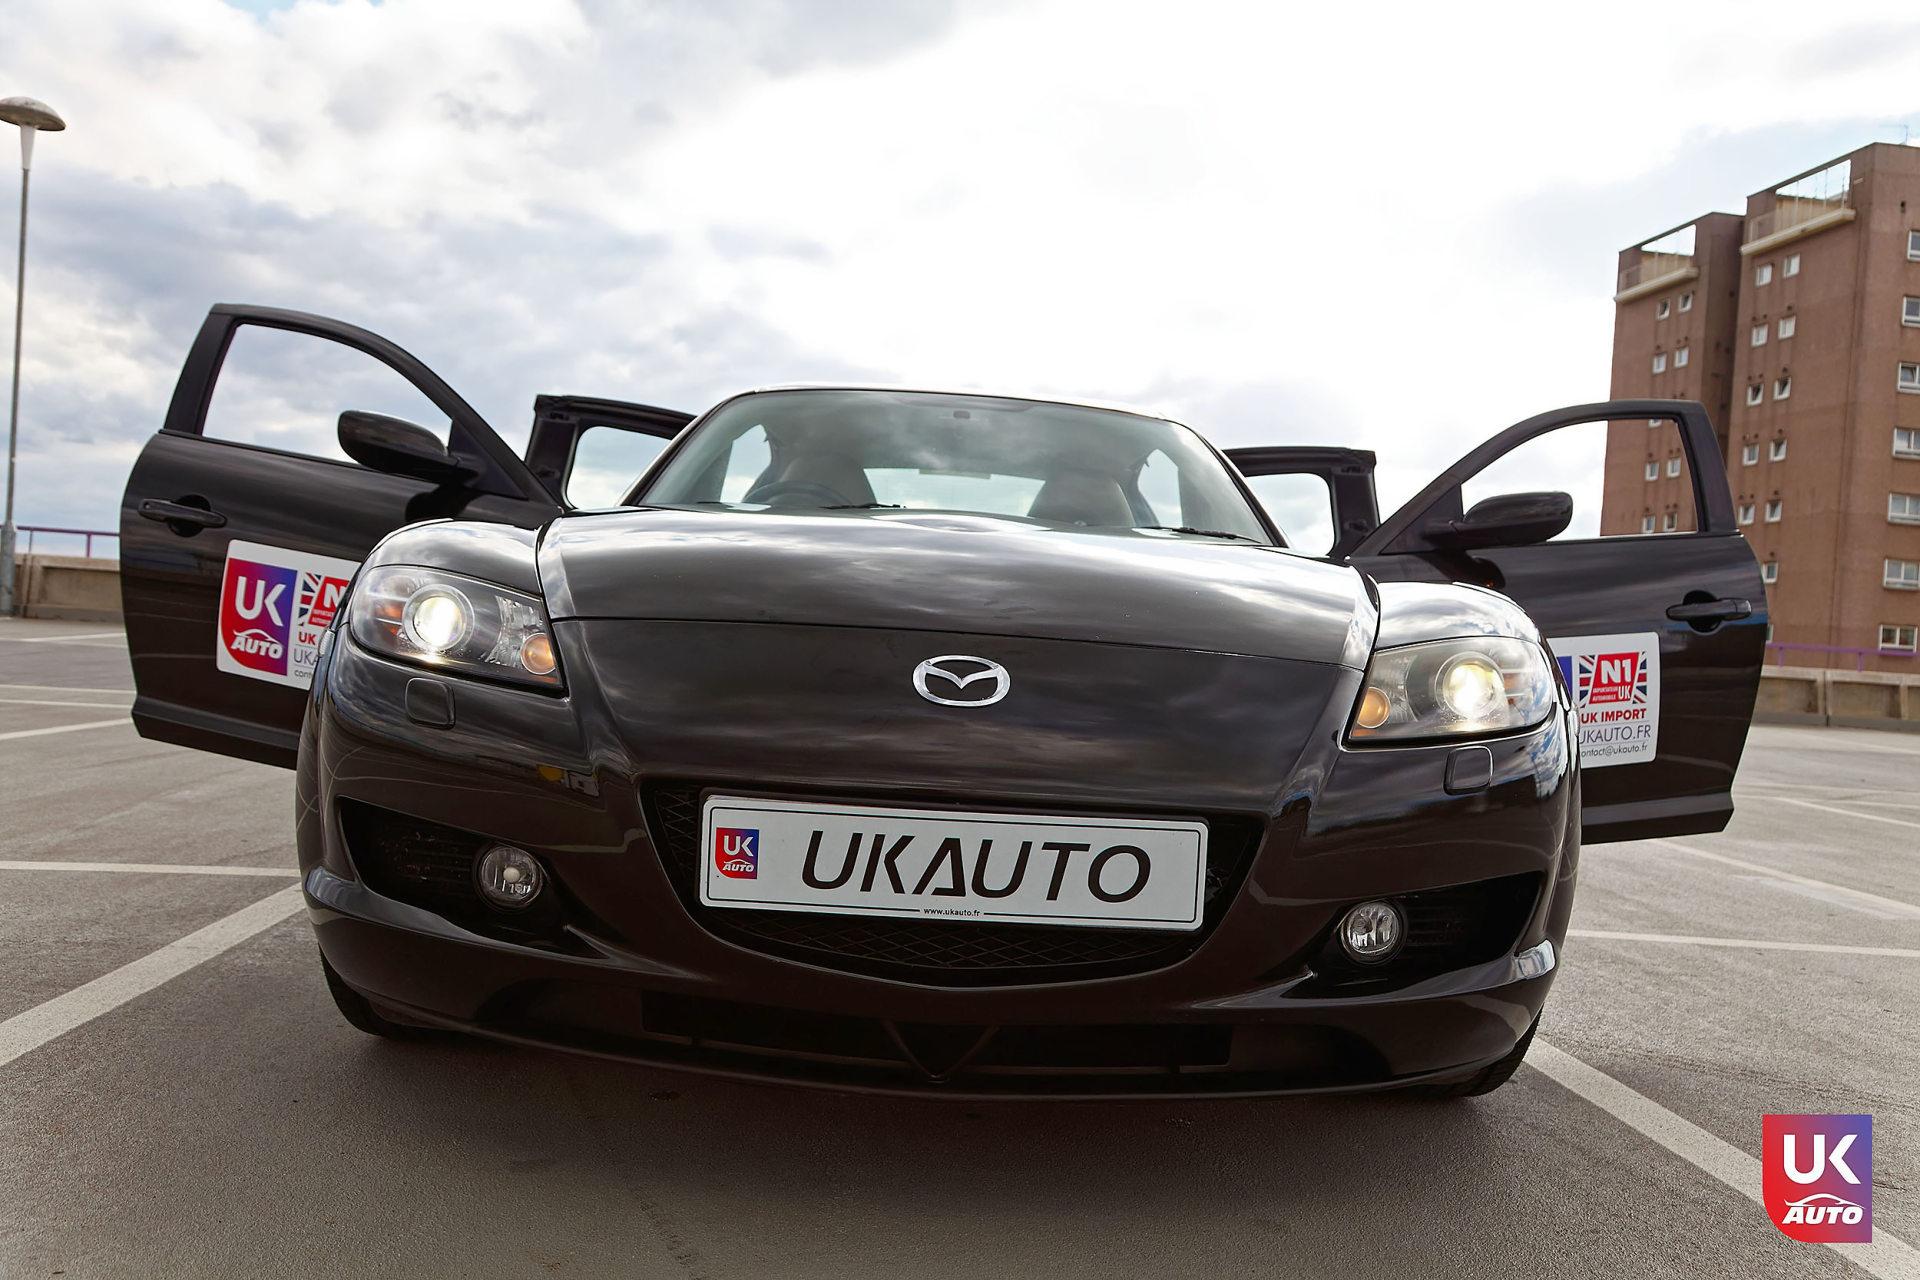 Mazda RX8 Rotary mazda angleterre mazda uk RX8 KURO import uk rhd9 DxO - Import Mazda RX8 KURO ROTARY depuis Autotrader par UKAUTO site annonces UK rhd Felicitation a Dimitri